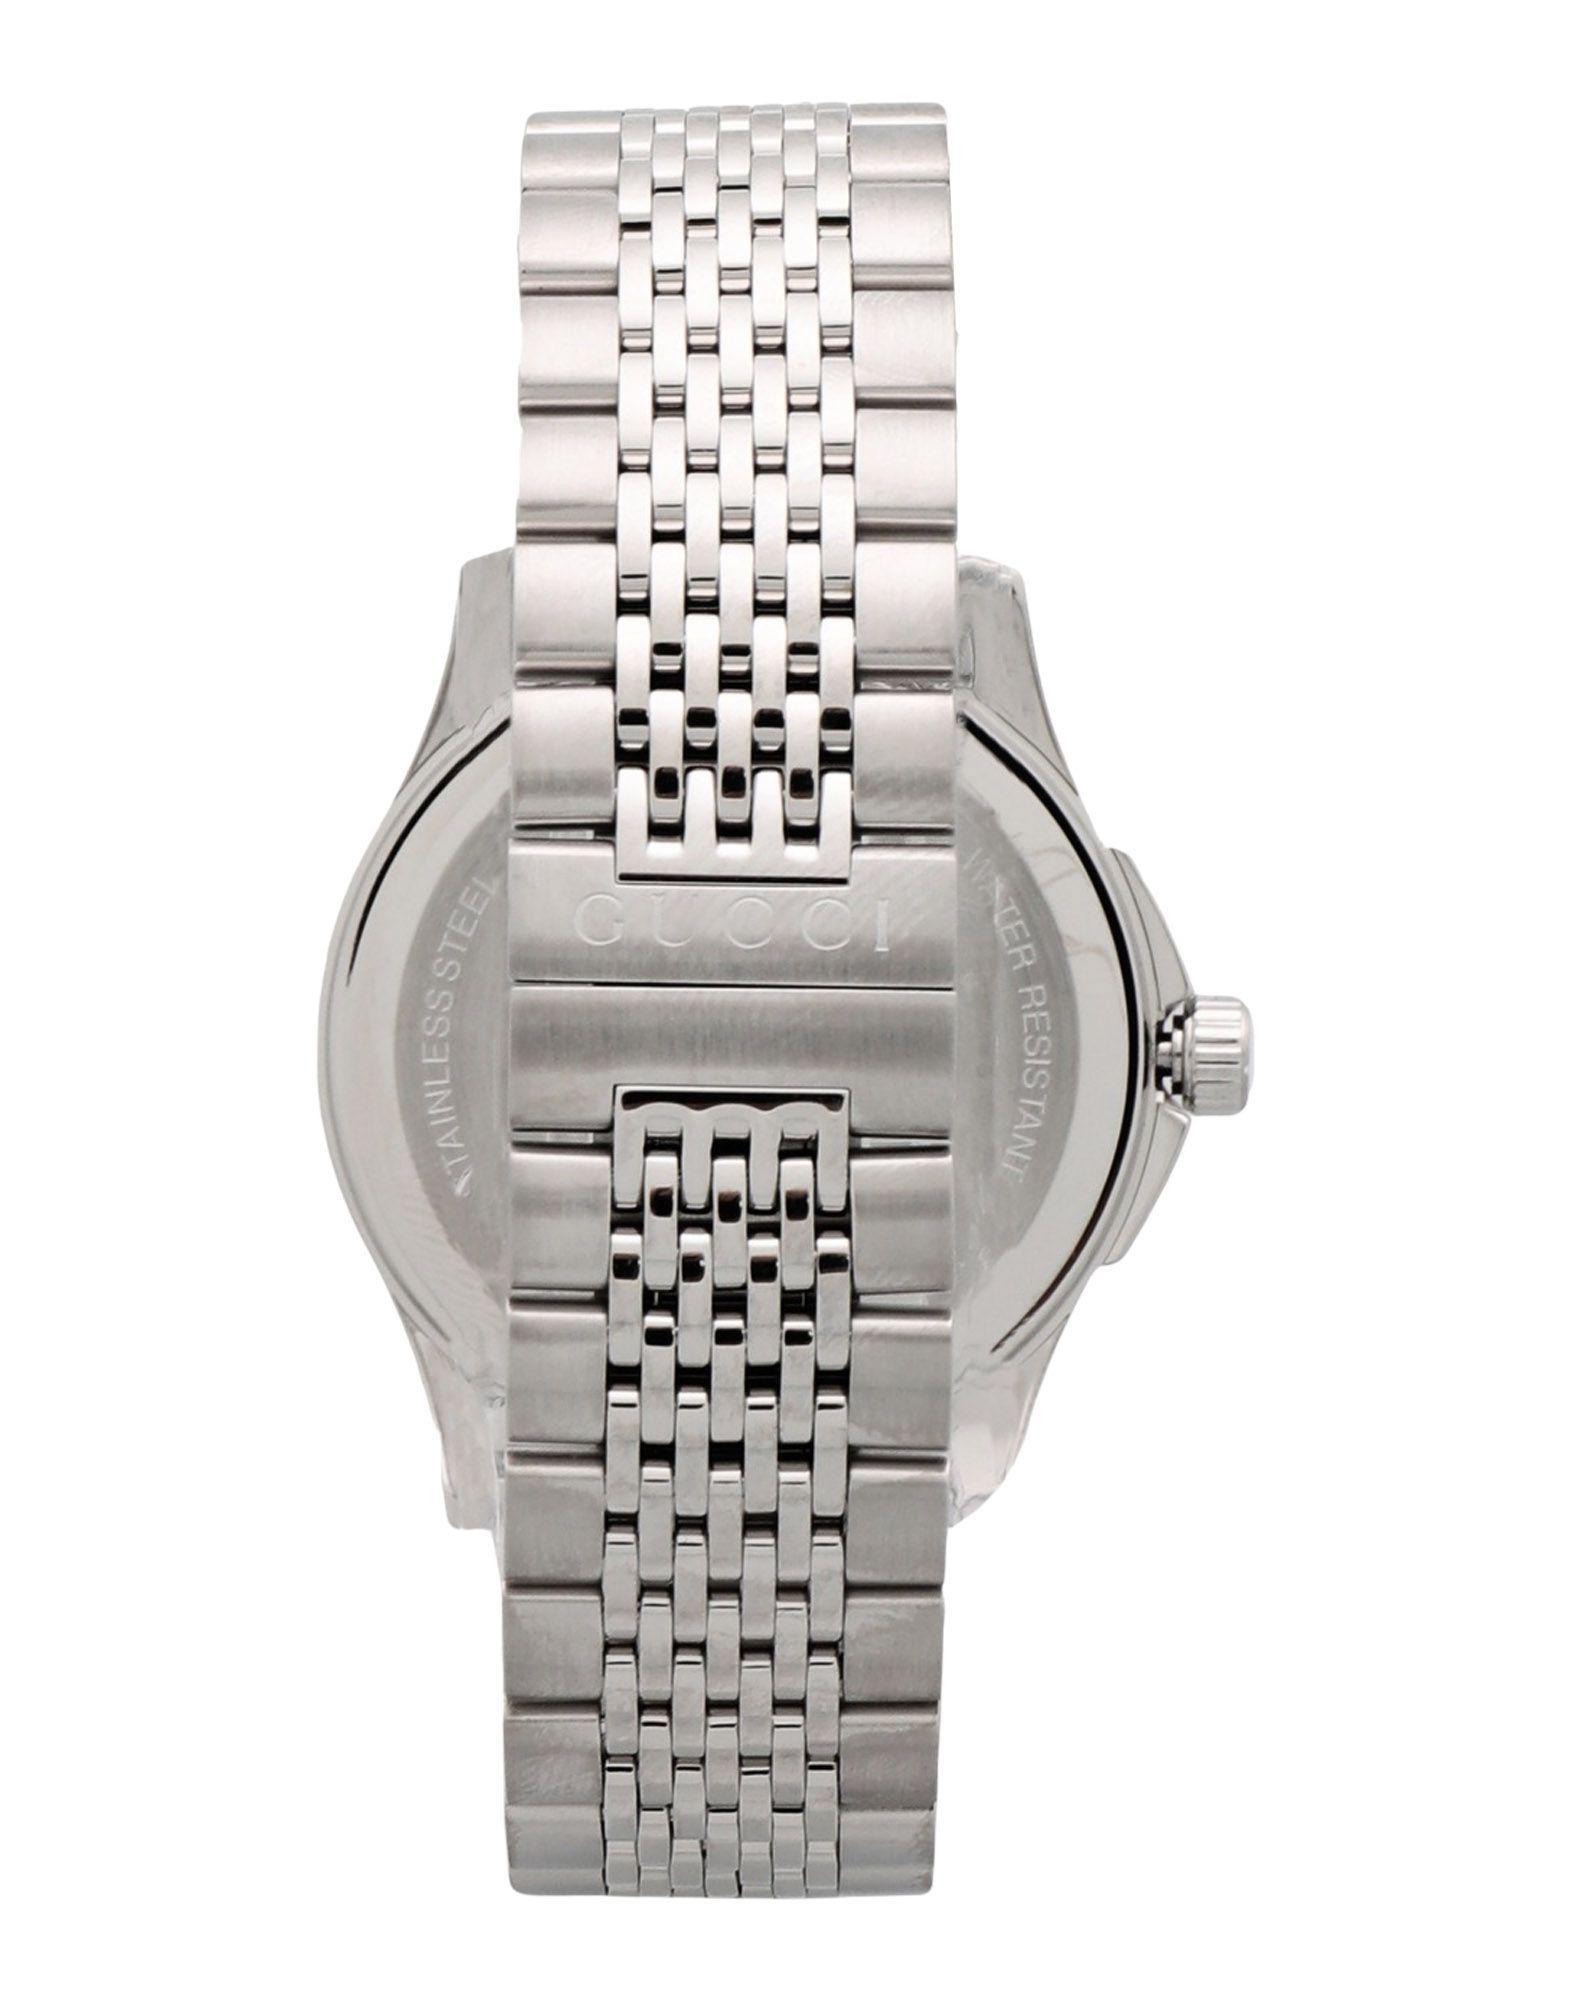 f321270b23c Lyst - Gucci Wrist Watch in Metallic for Men